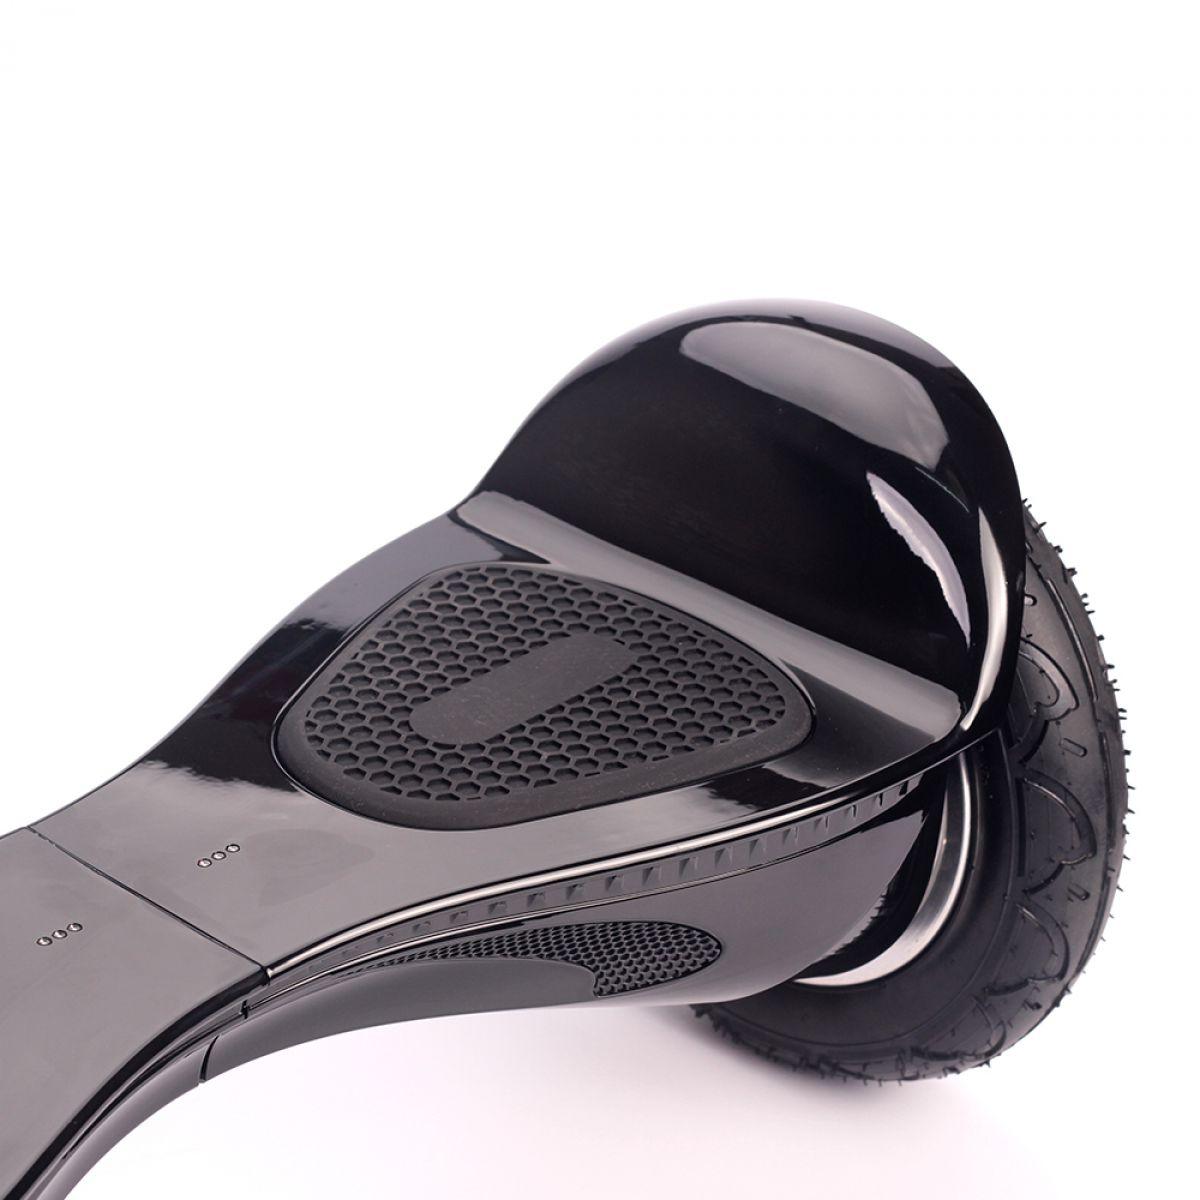 10 zoll hoverboard e balance elektro scooter elektroroller smart eboard board ebay. Black Bedroom Furniture Sets. Home Design Ideas